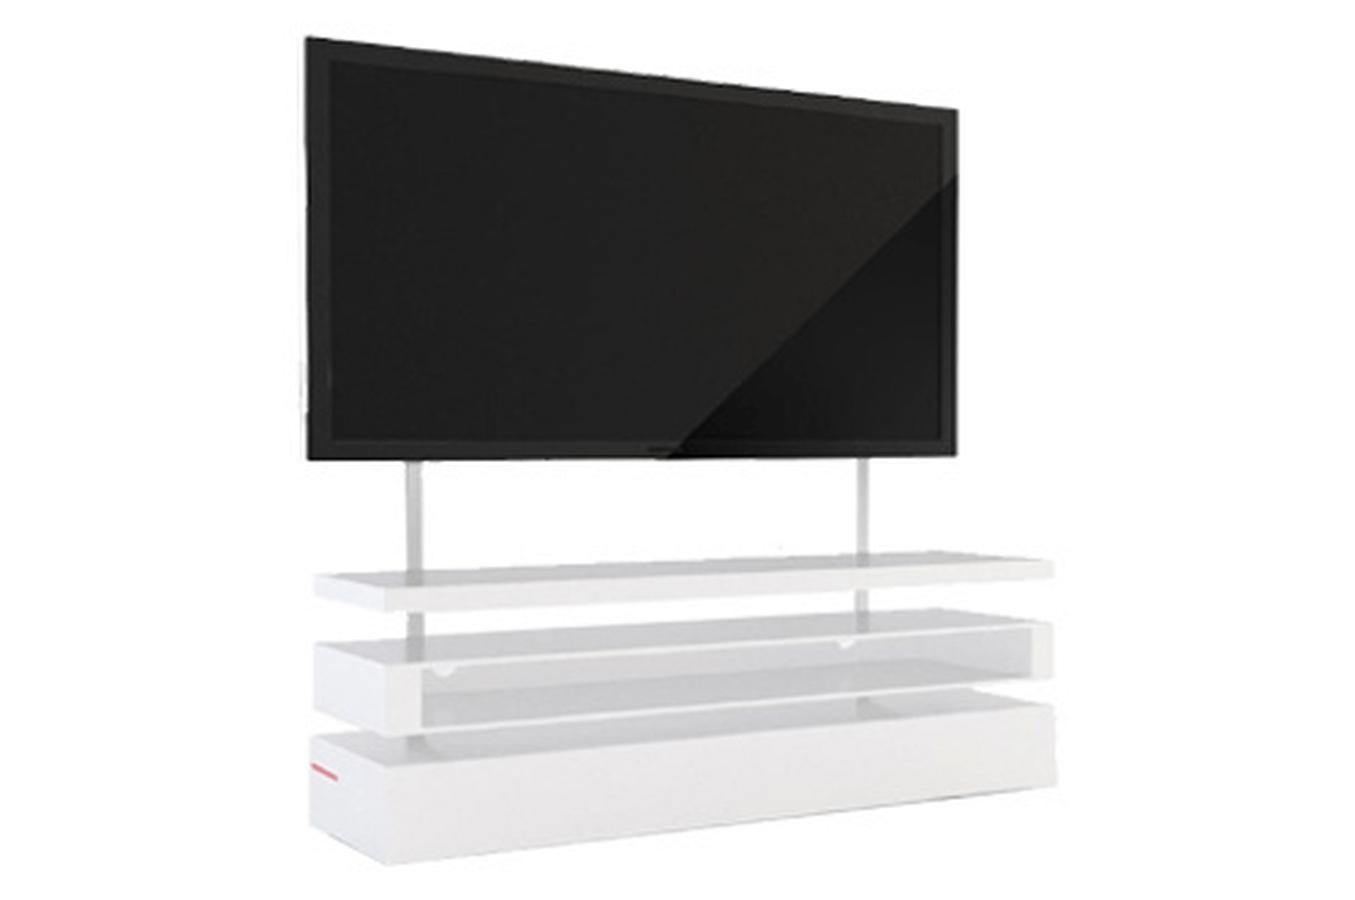 Meuble TV Samsung F NAPOLI SAMW 3291812 Darty